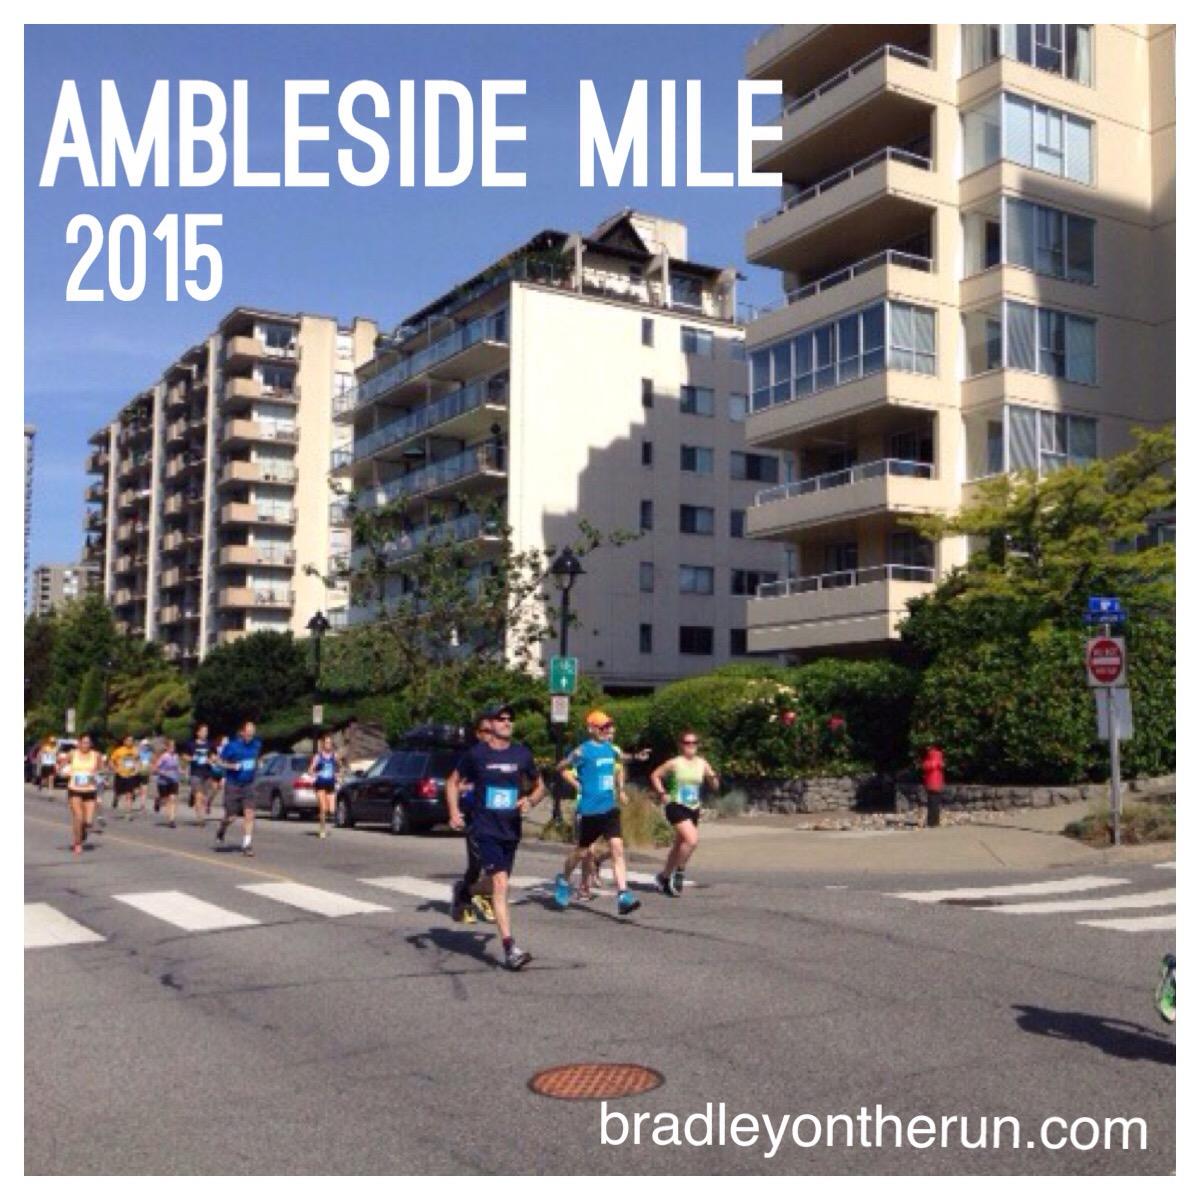 Ambleside Mile 2015